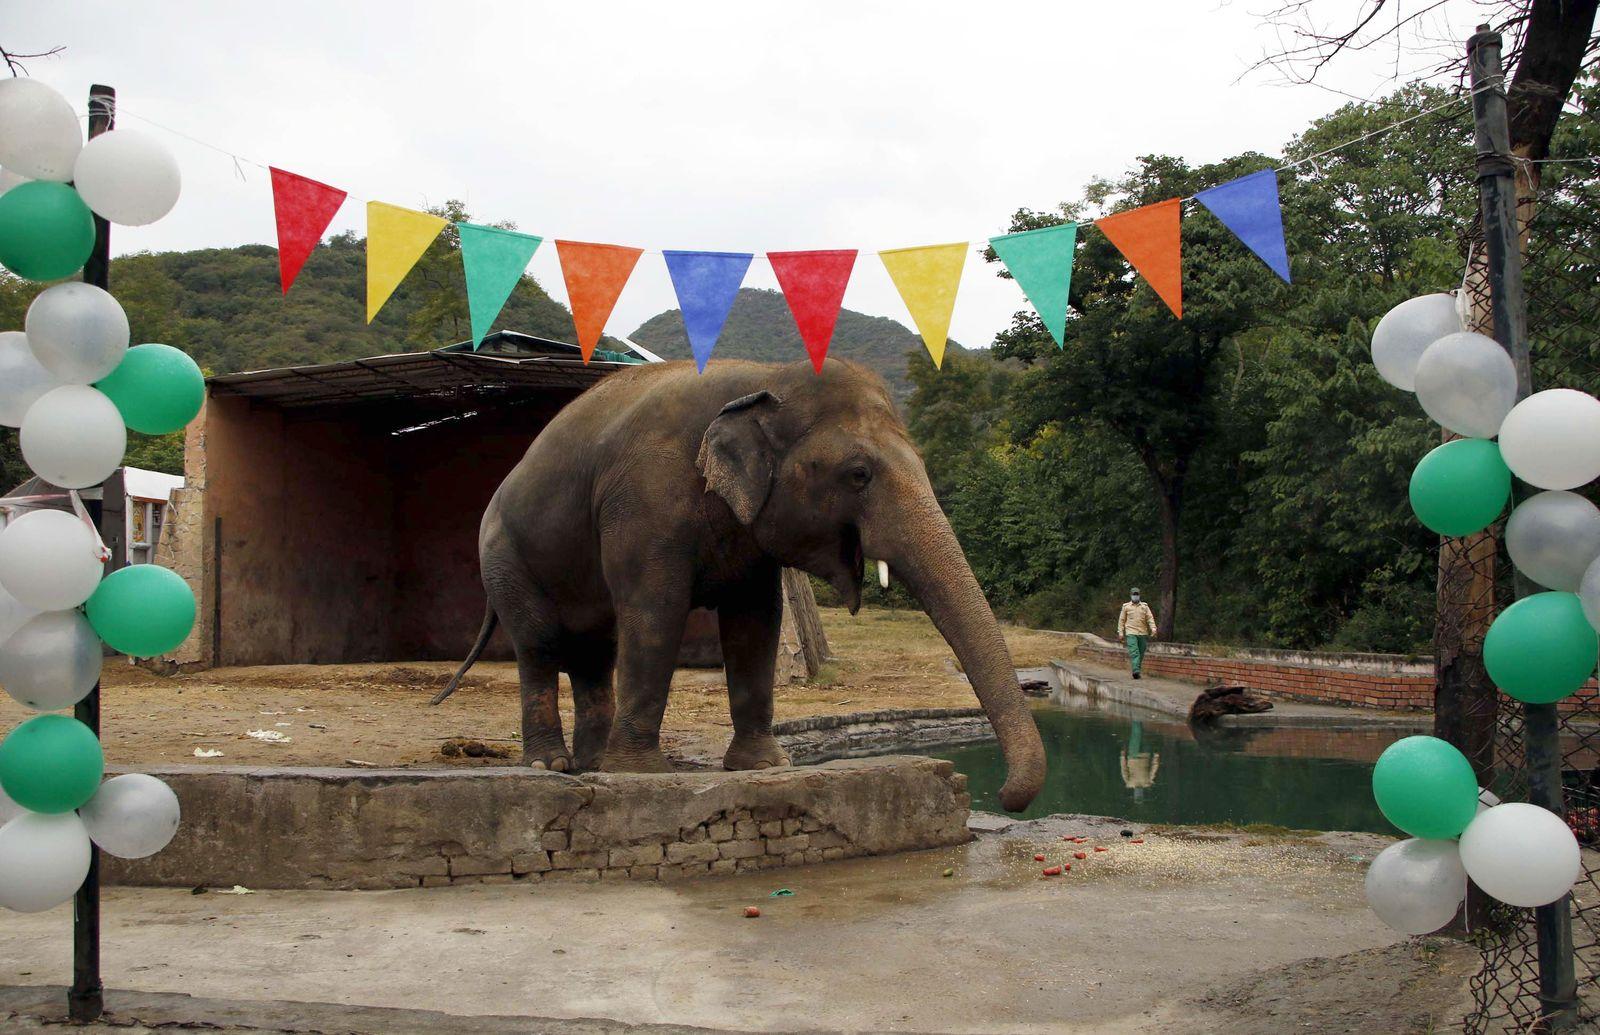 Elephant Kaavan will return to Cambodia from Islamabad, Pakistan - 23 Nov 2020